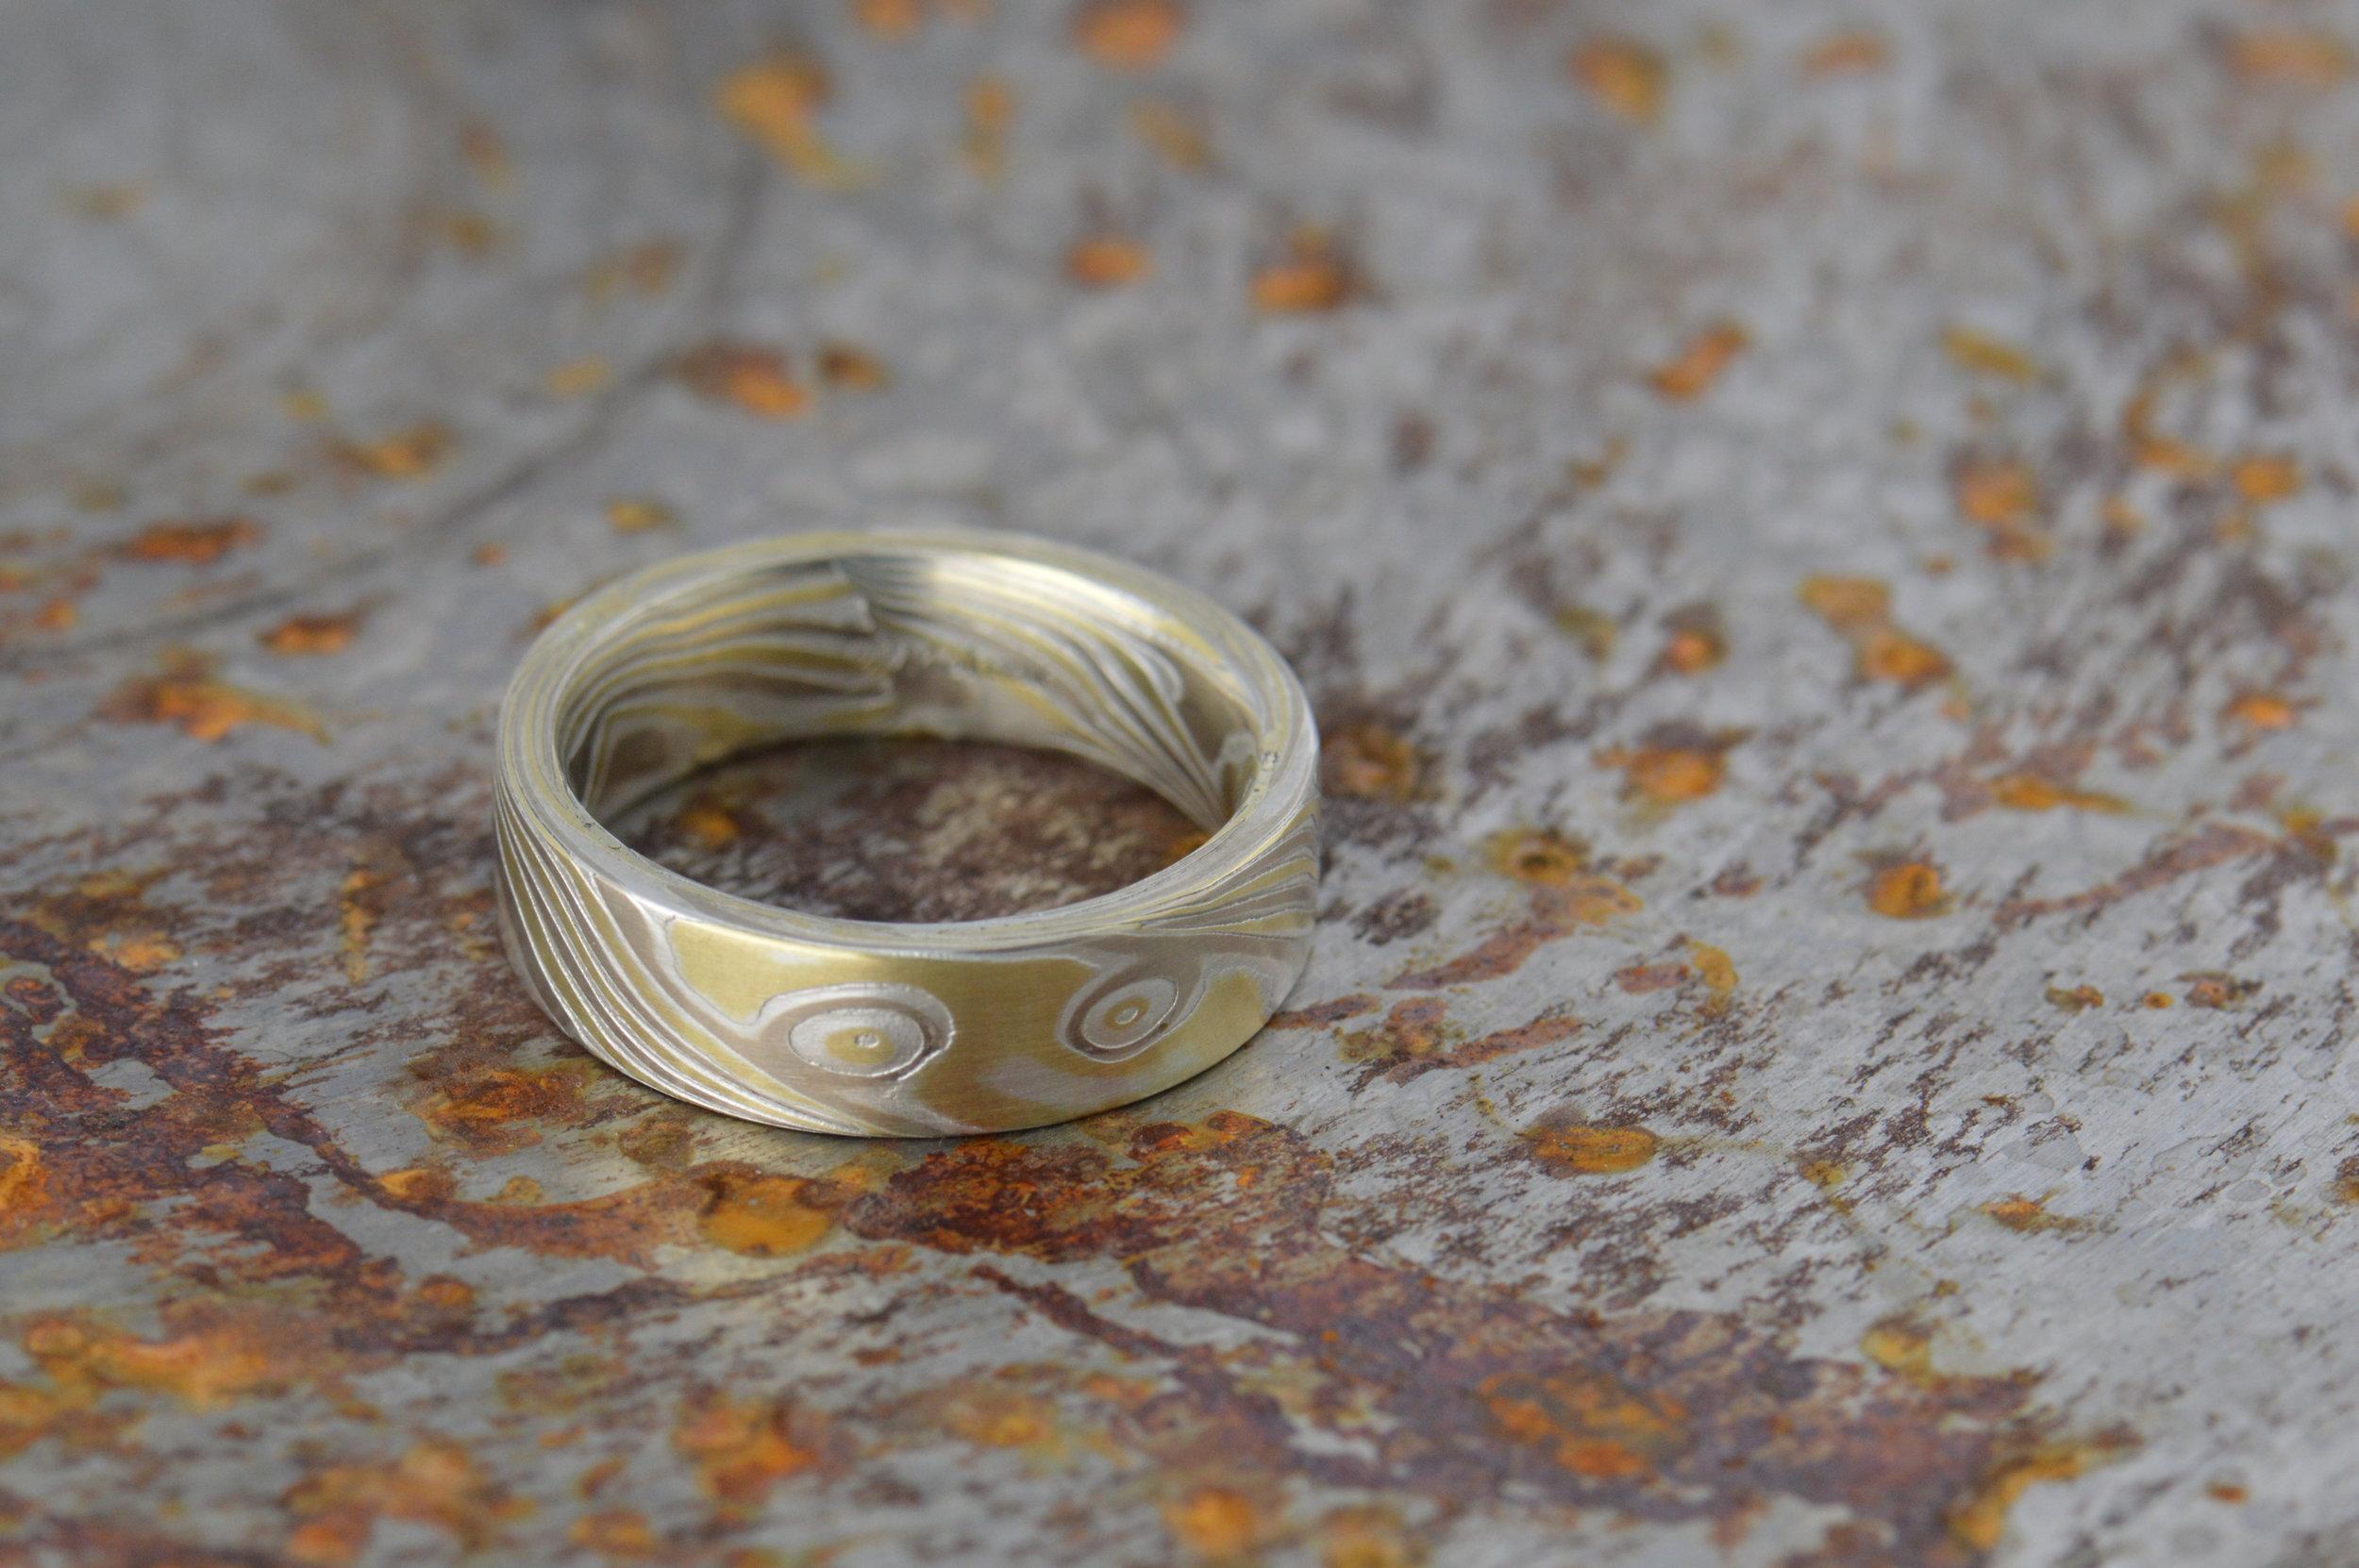 darvier-18k-palladium-burl-wedding-band-pipe-cut.JPG